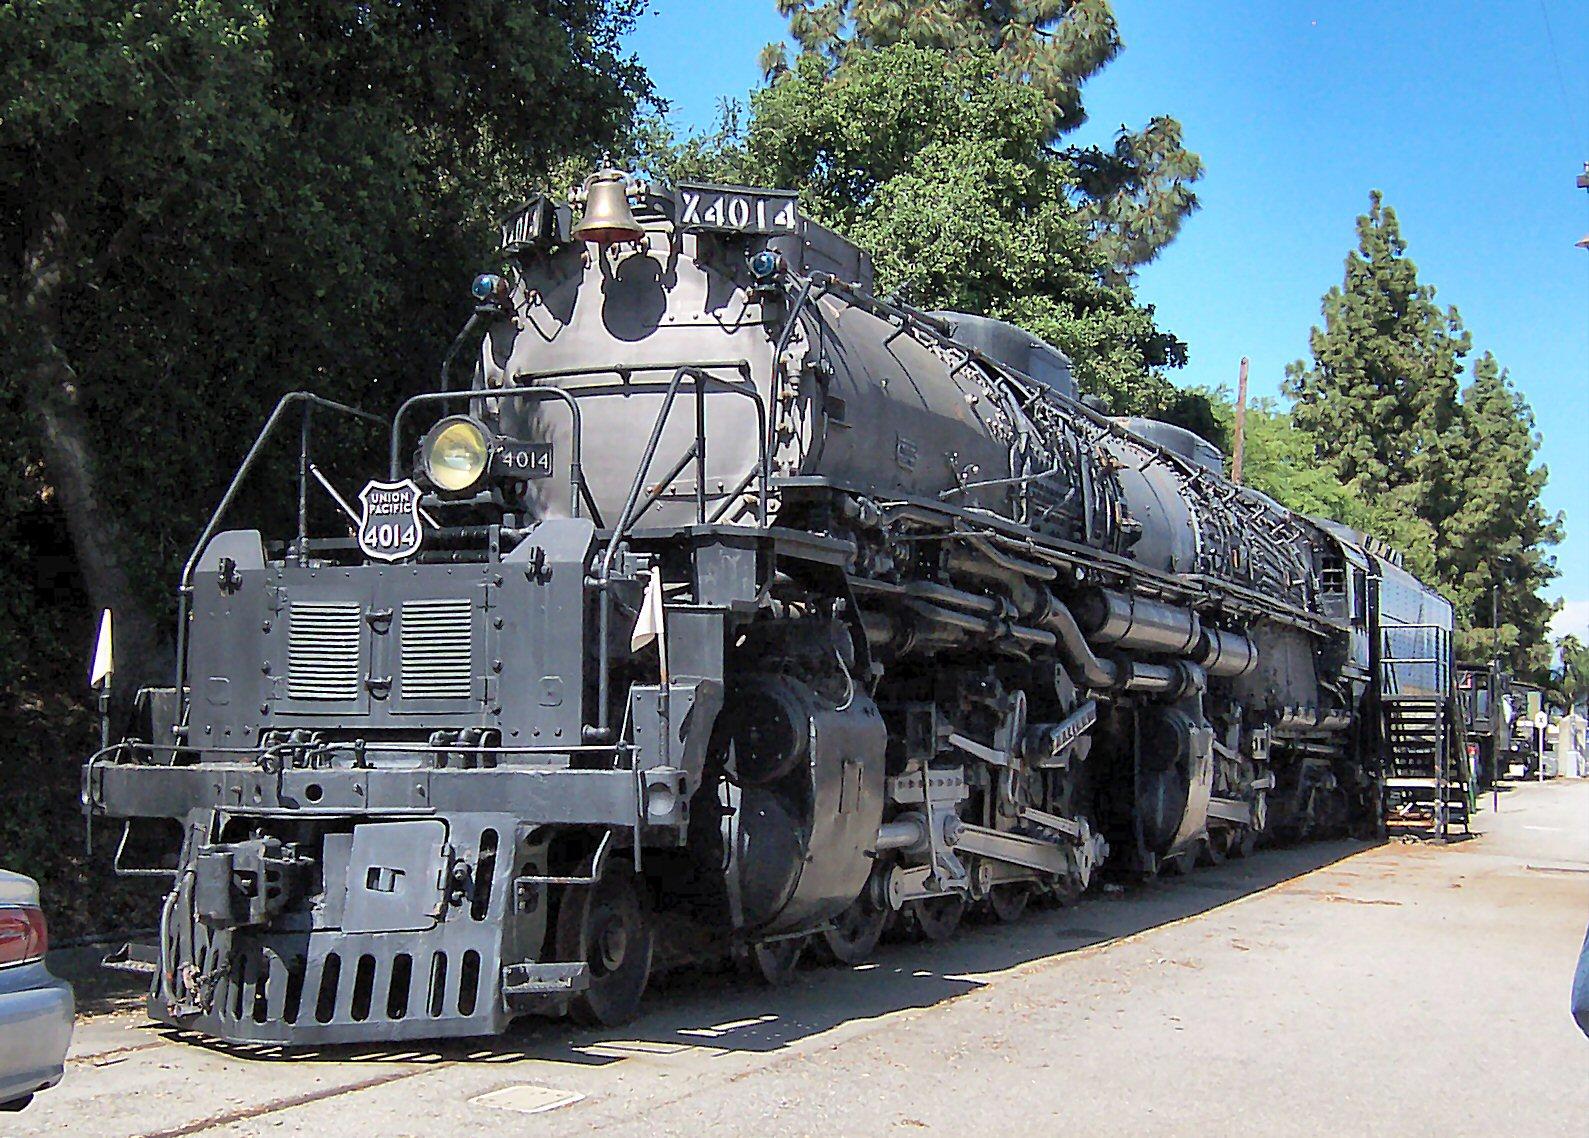 Union Pacific Big Boy Locomotive